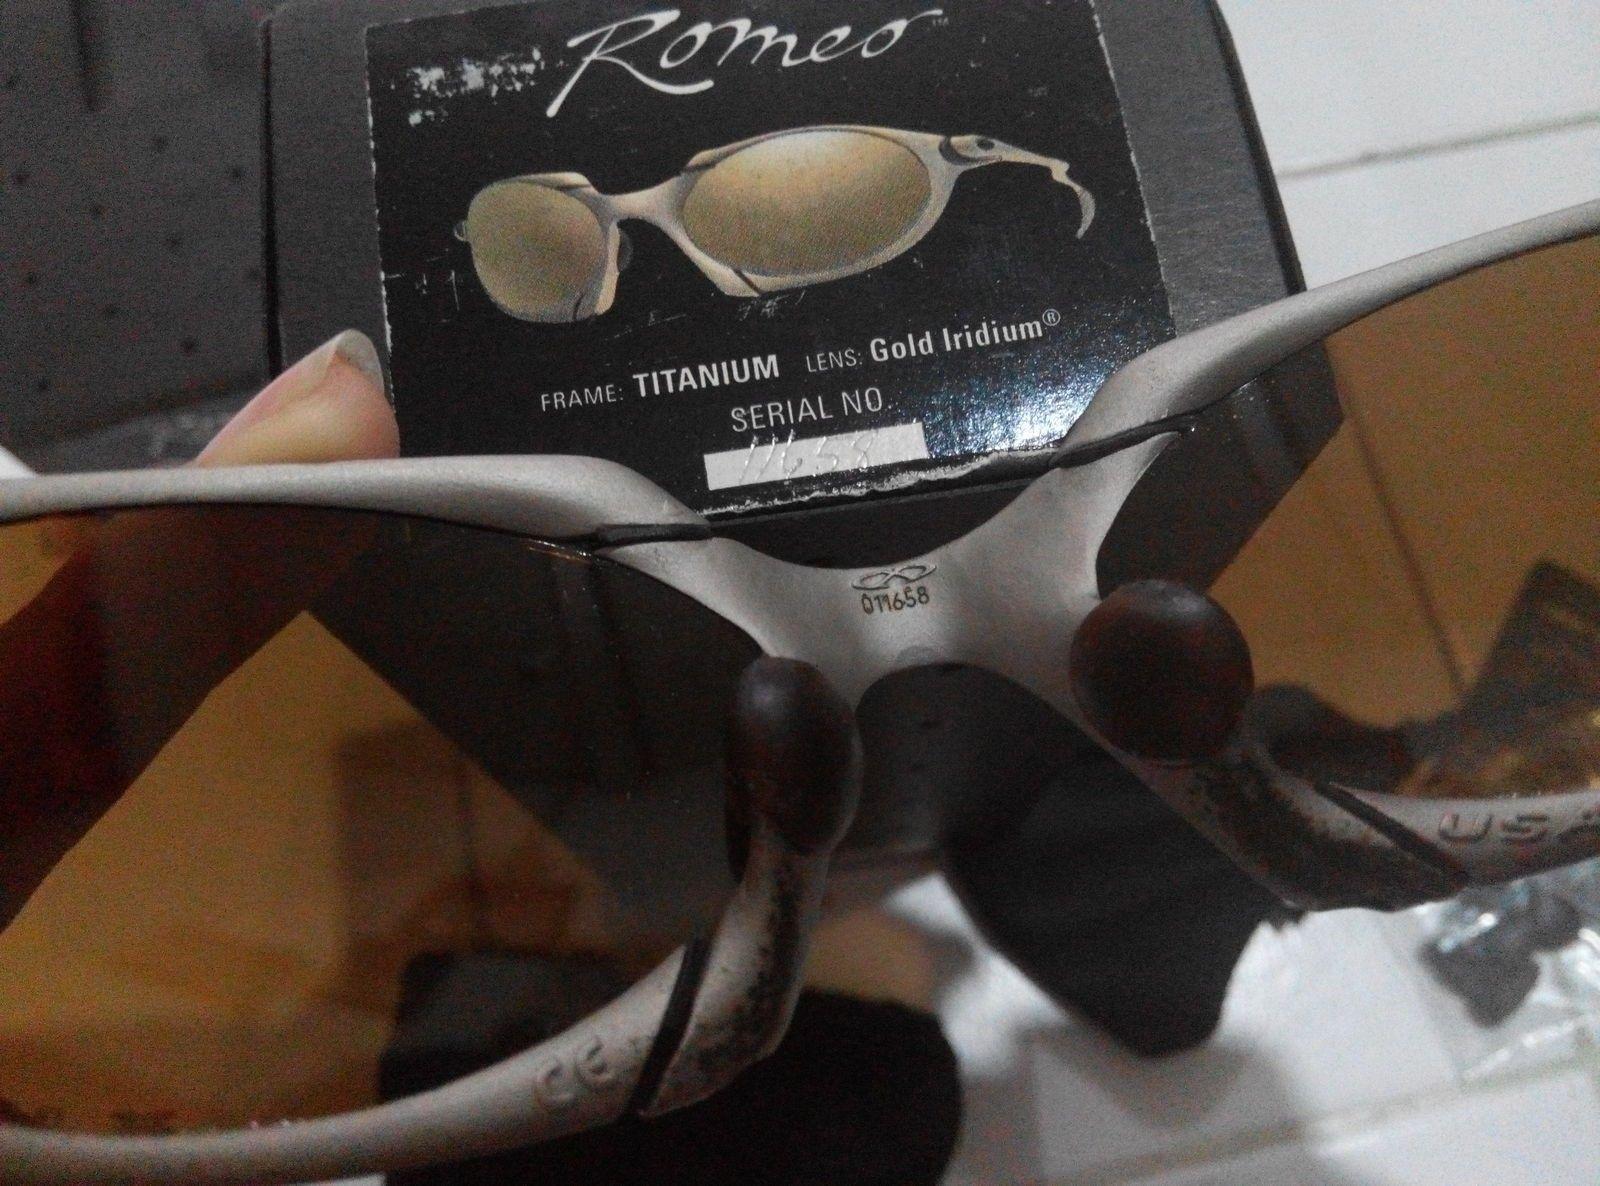 2pcs r1 titanium - IMG_20150424_180130.jpg